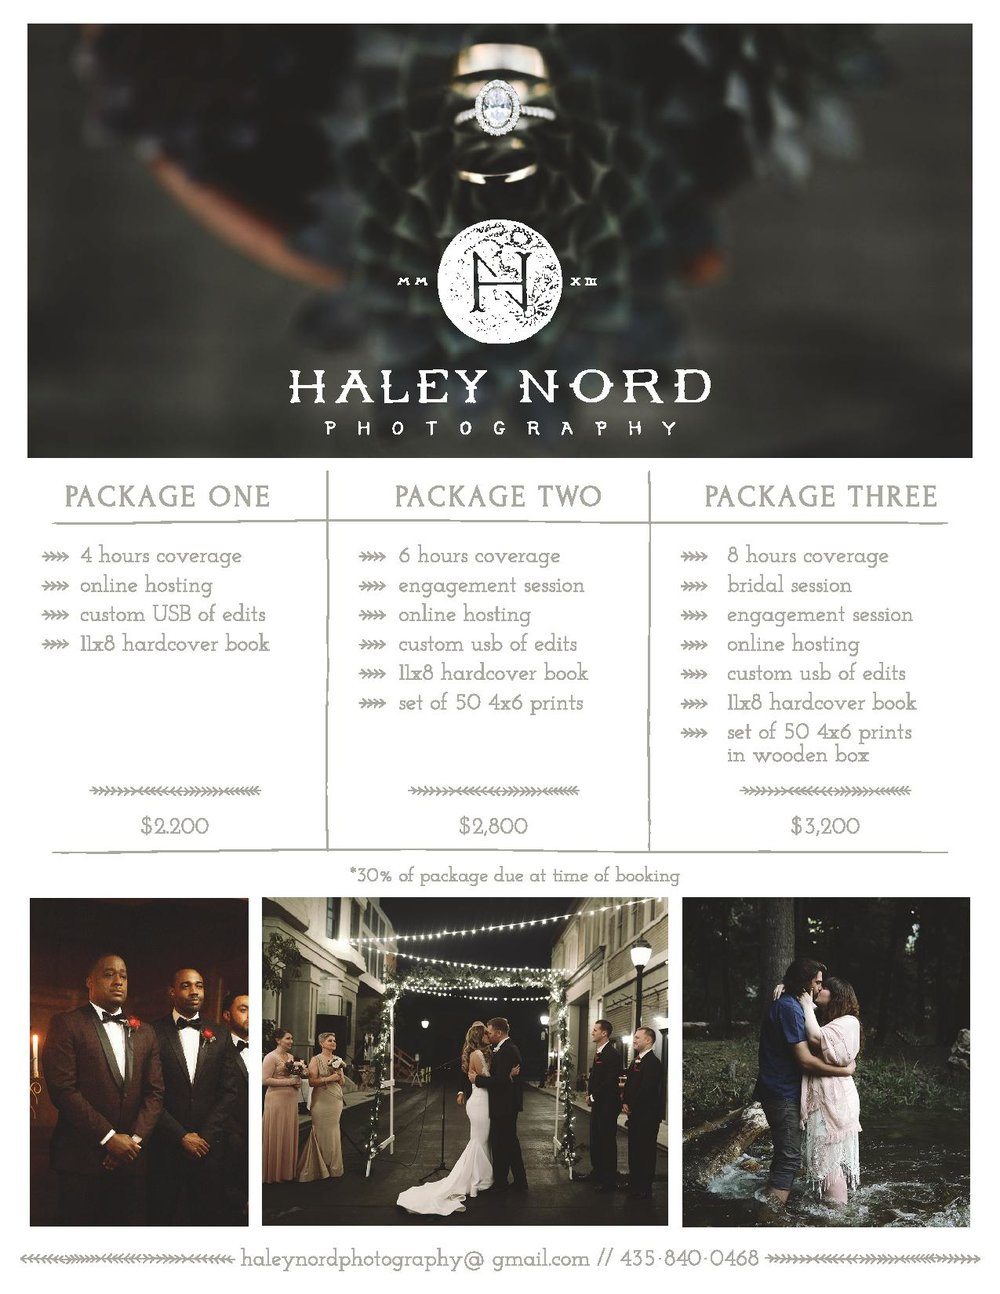 HaleyNord_Pricing2 (1)-page-001.jpg